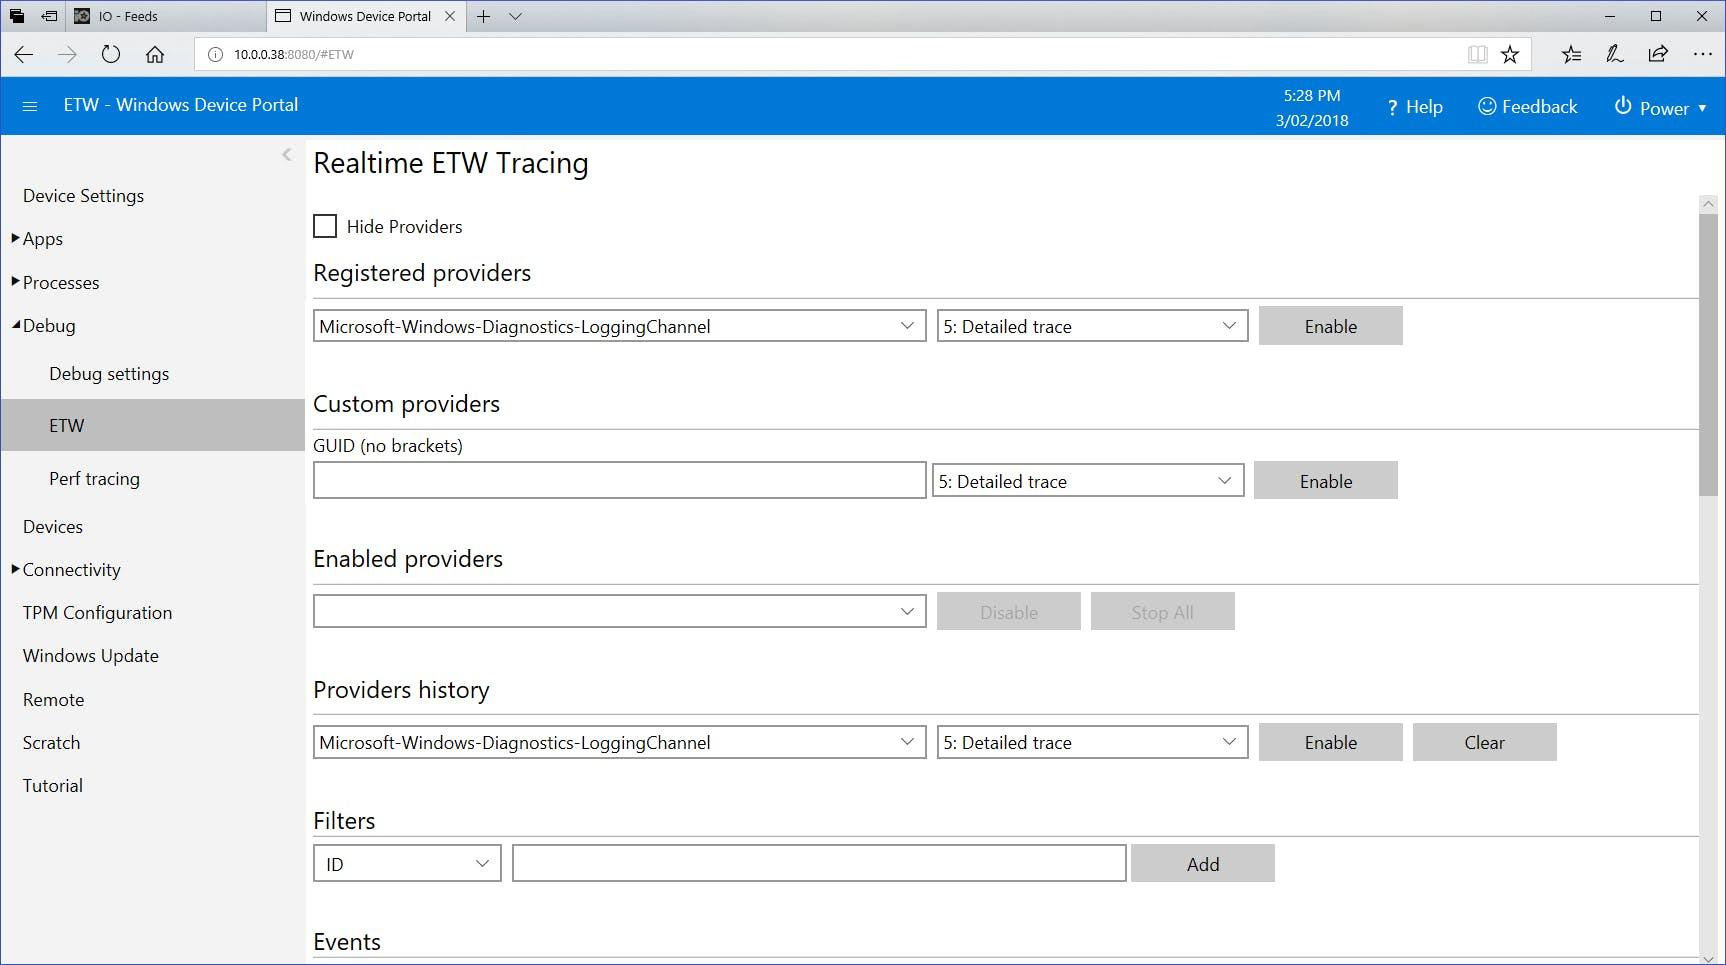 Windows 10 ETW Setup viewed using device portal